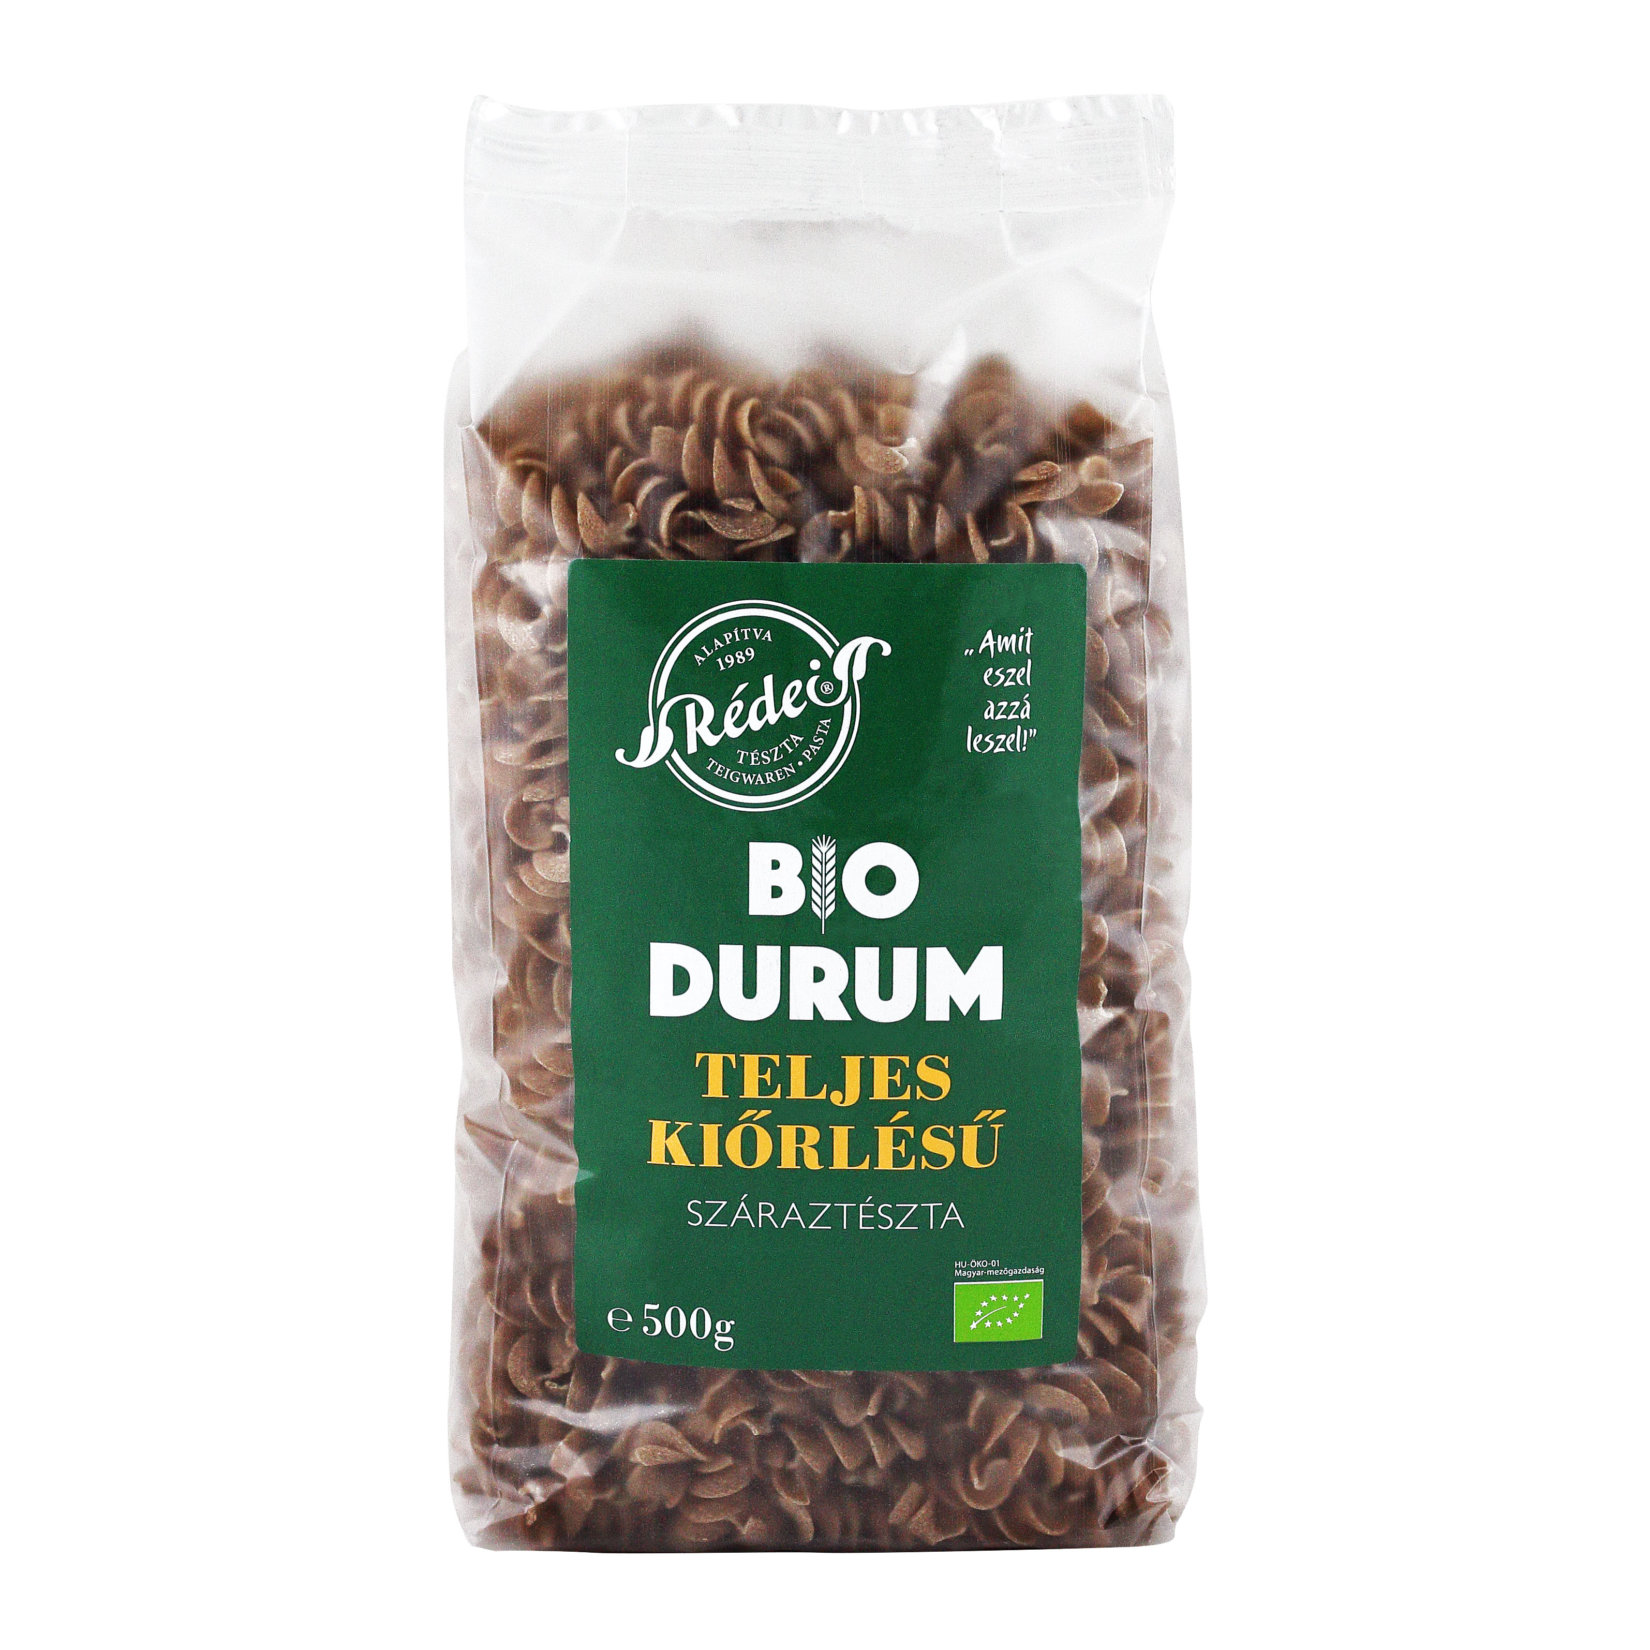 BioDurum_TK_orso_500g_IMG_6990